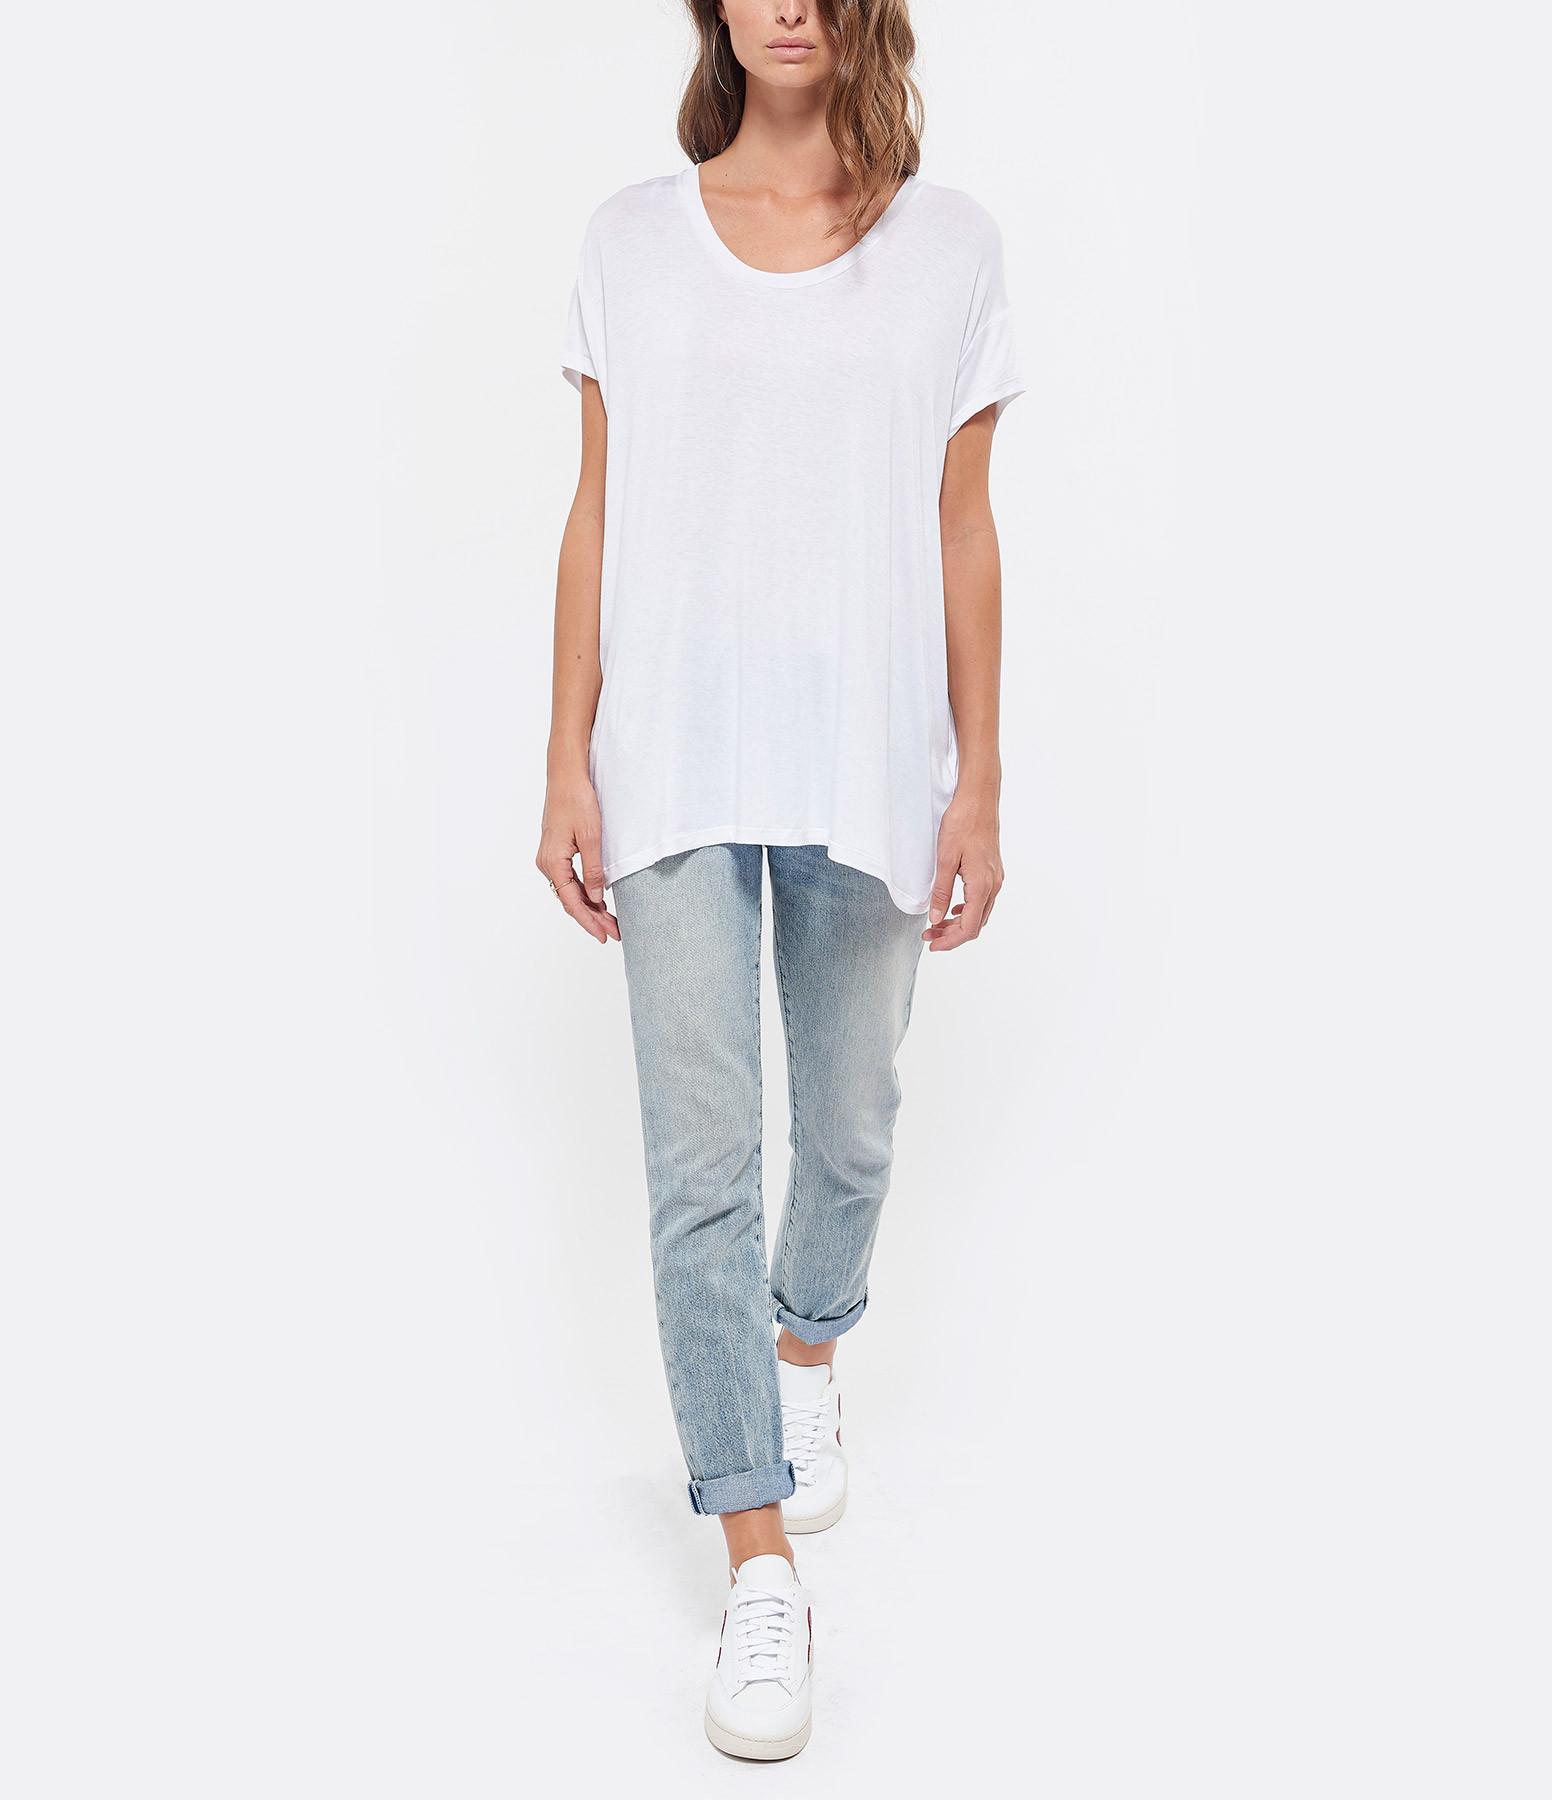 MARGAUX LONNBERG - Tee-shirt Marlow Blanc